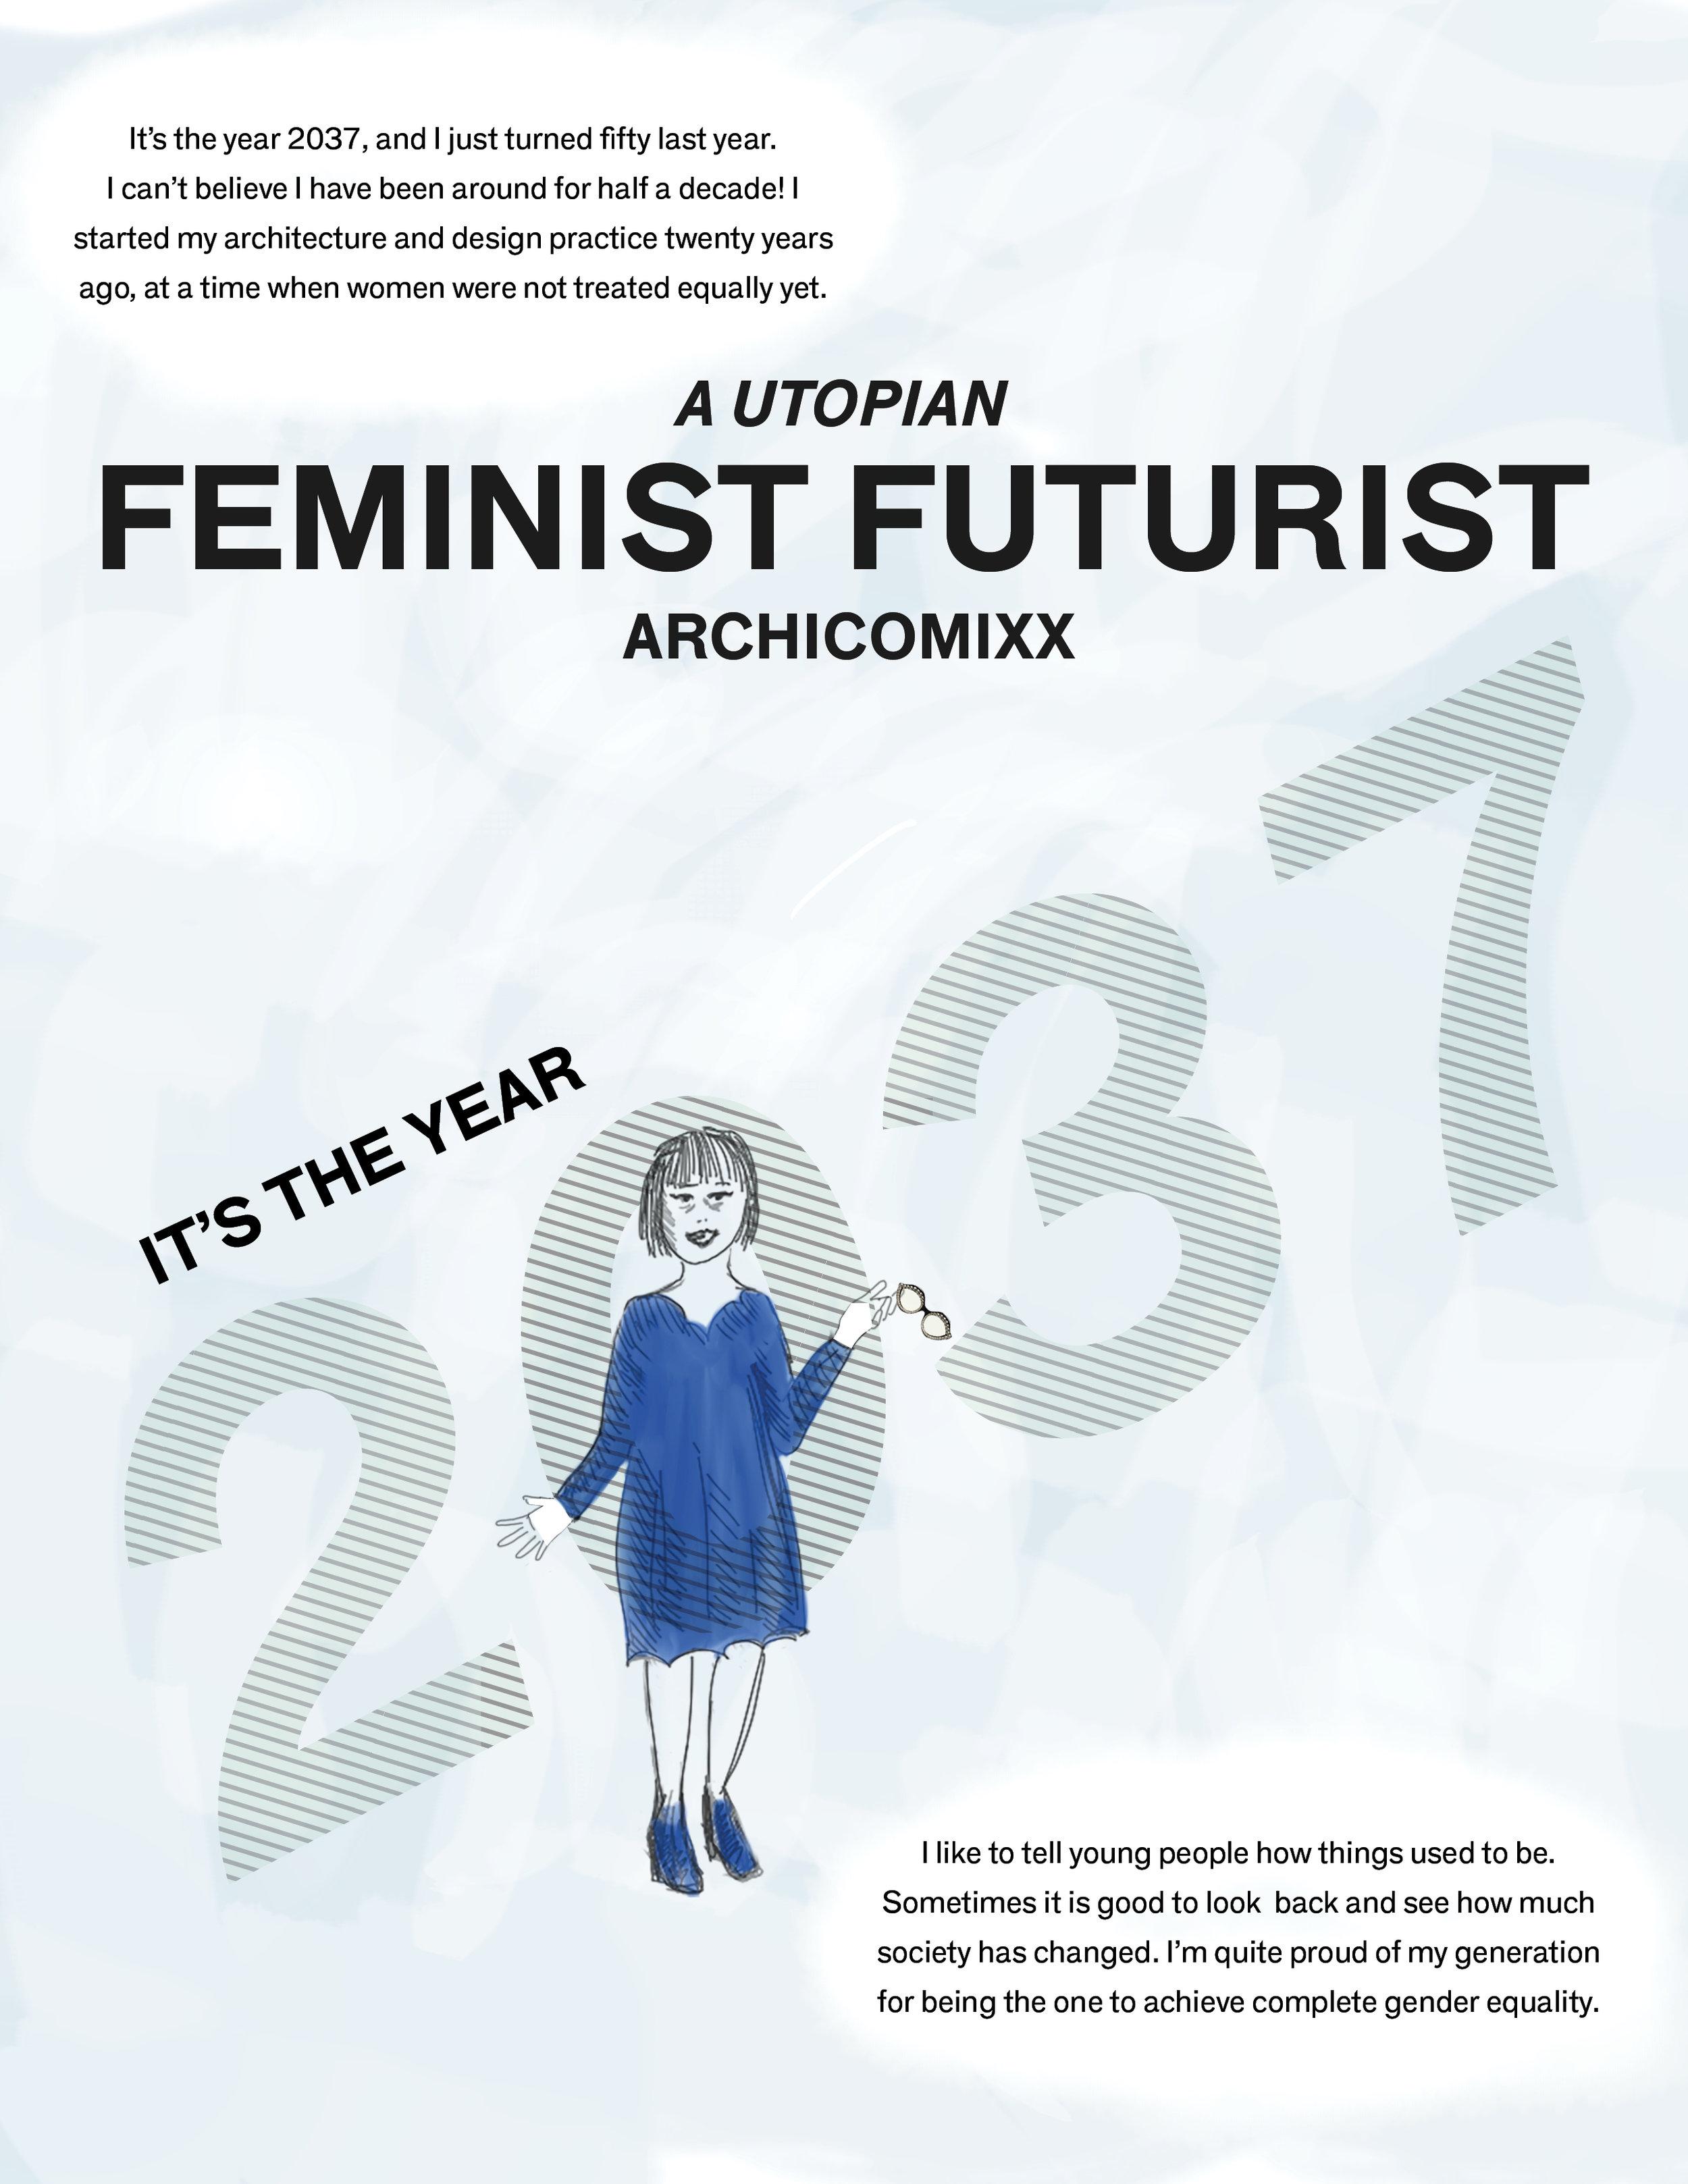 171127_2037_feminist futurist_fin